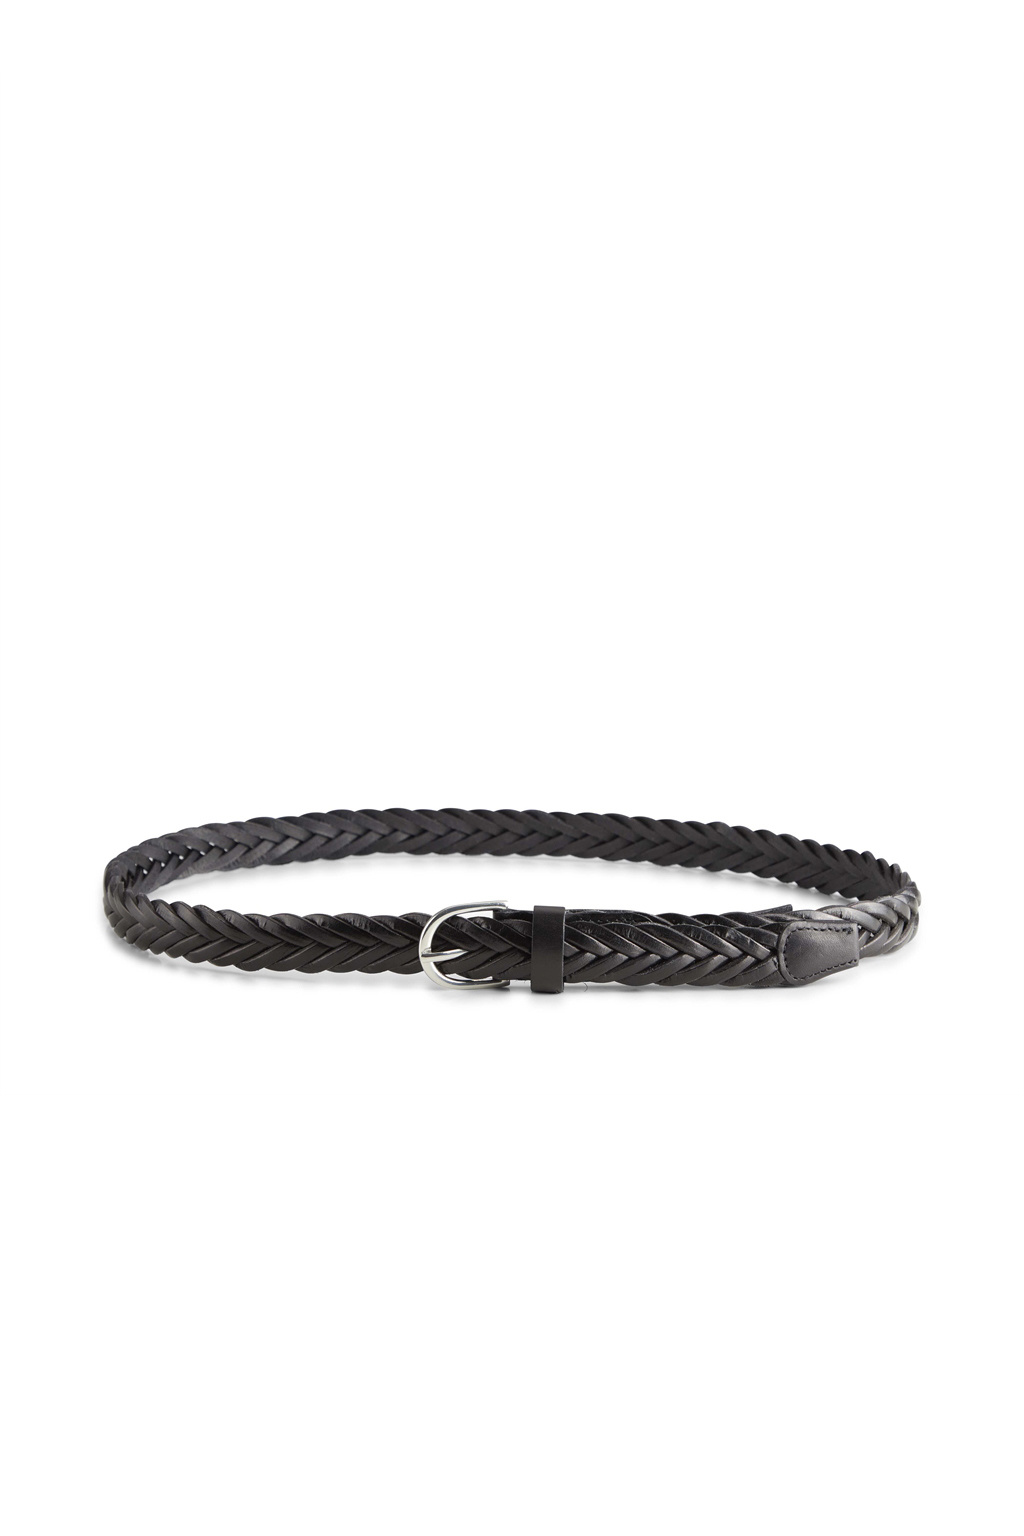 Nerea Leather Belt - Black-2